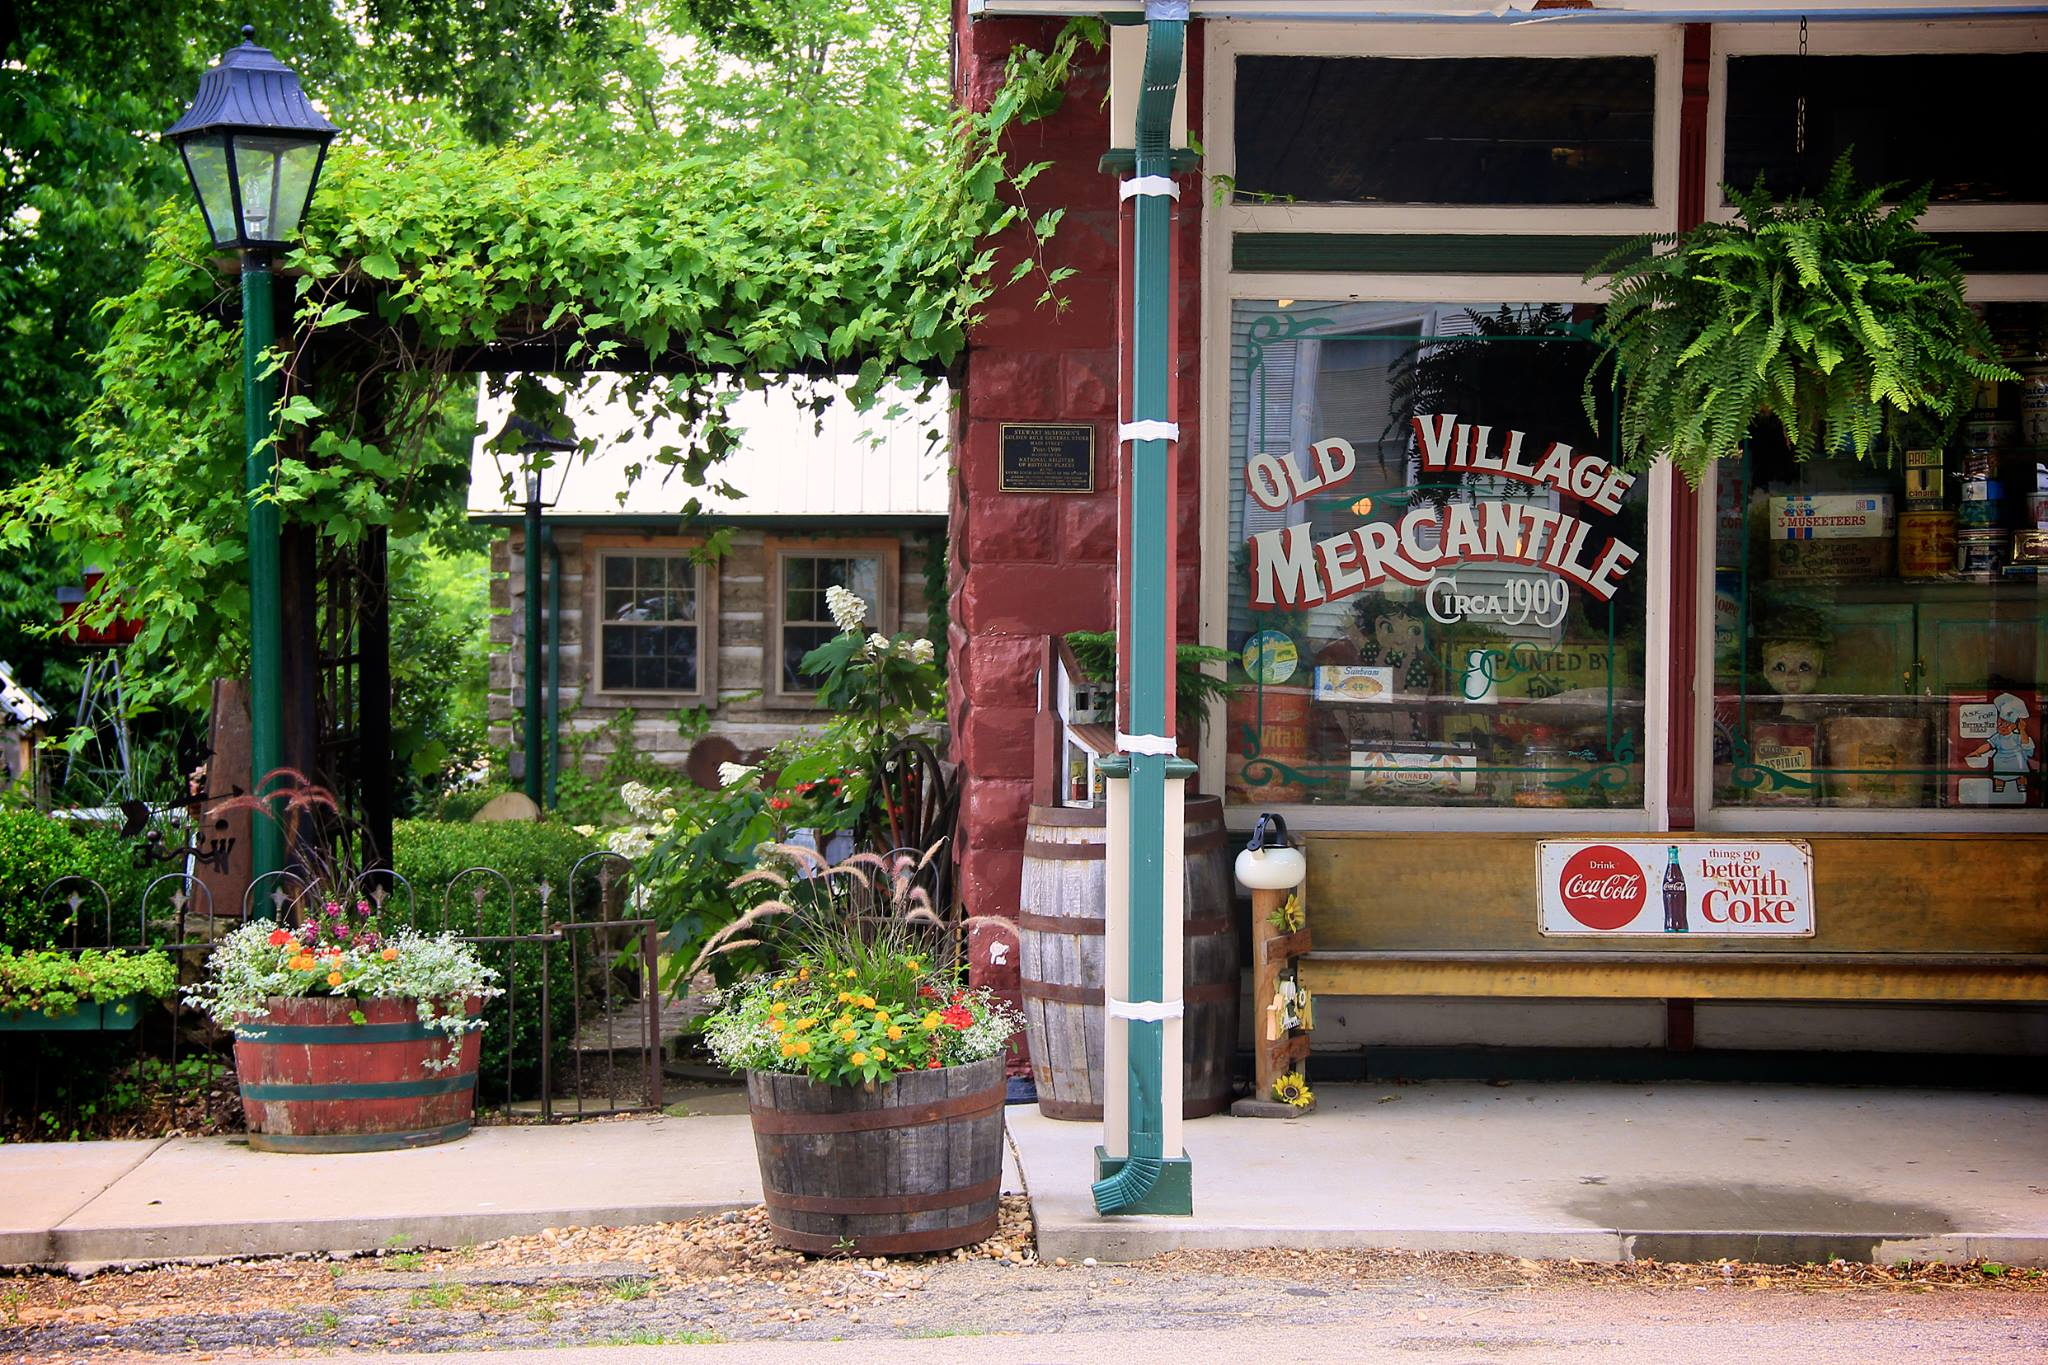 Take A Trip Down Memory Lane When You Visit The 5 Oldest Shops In Missouri